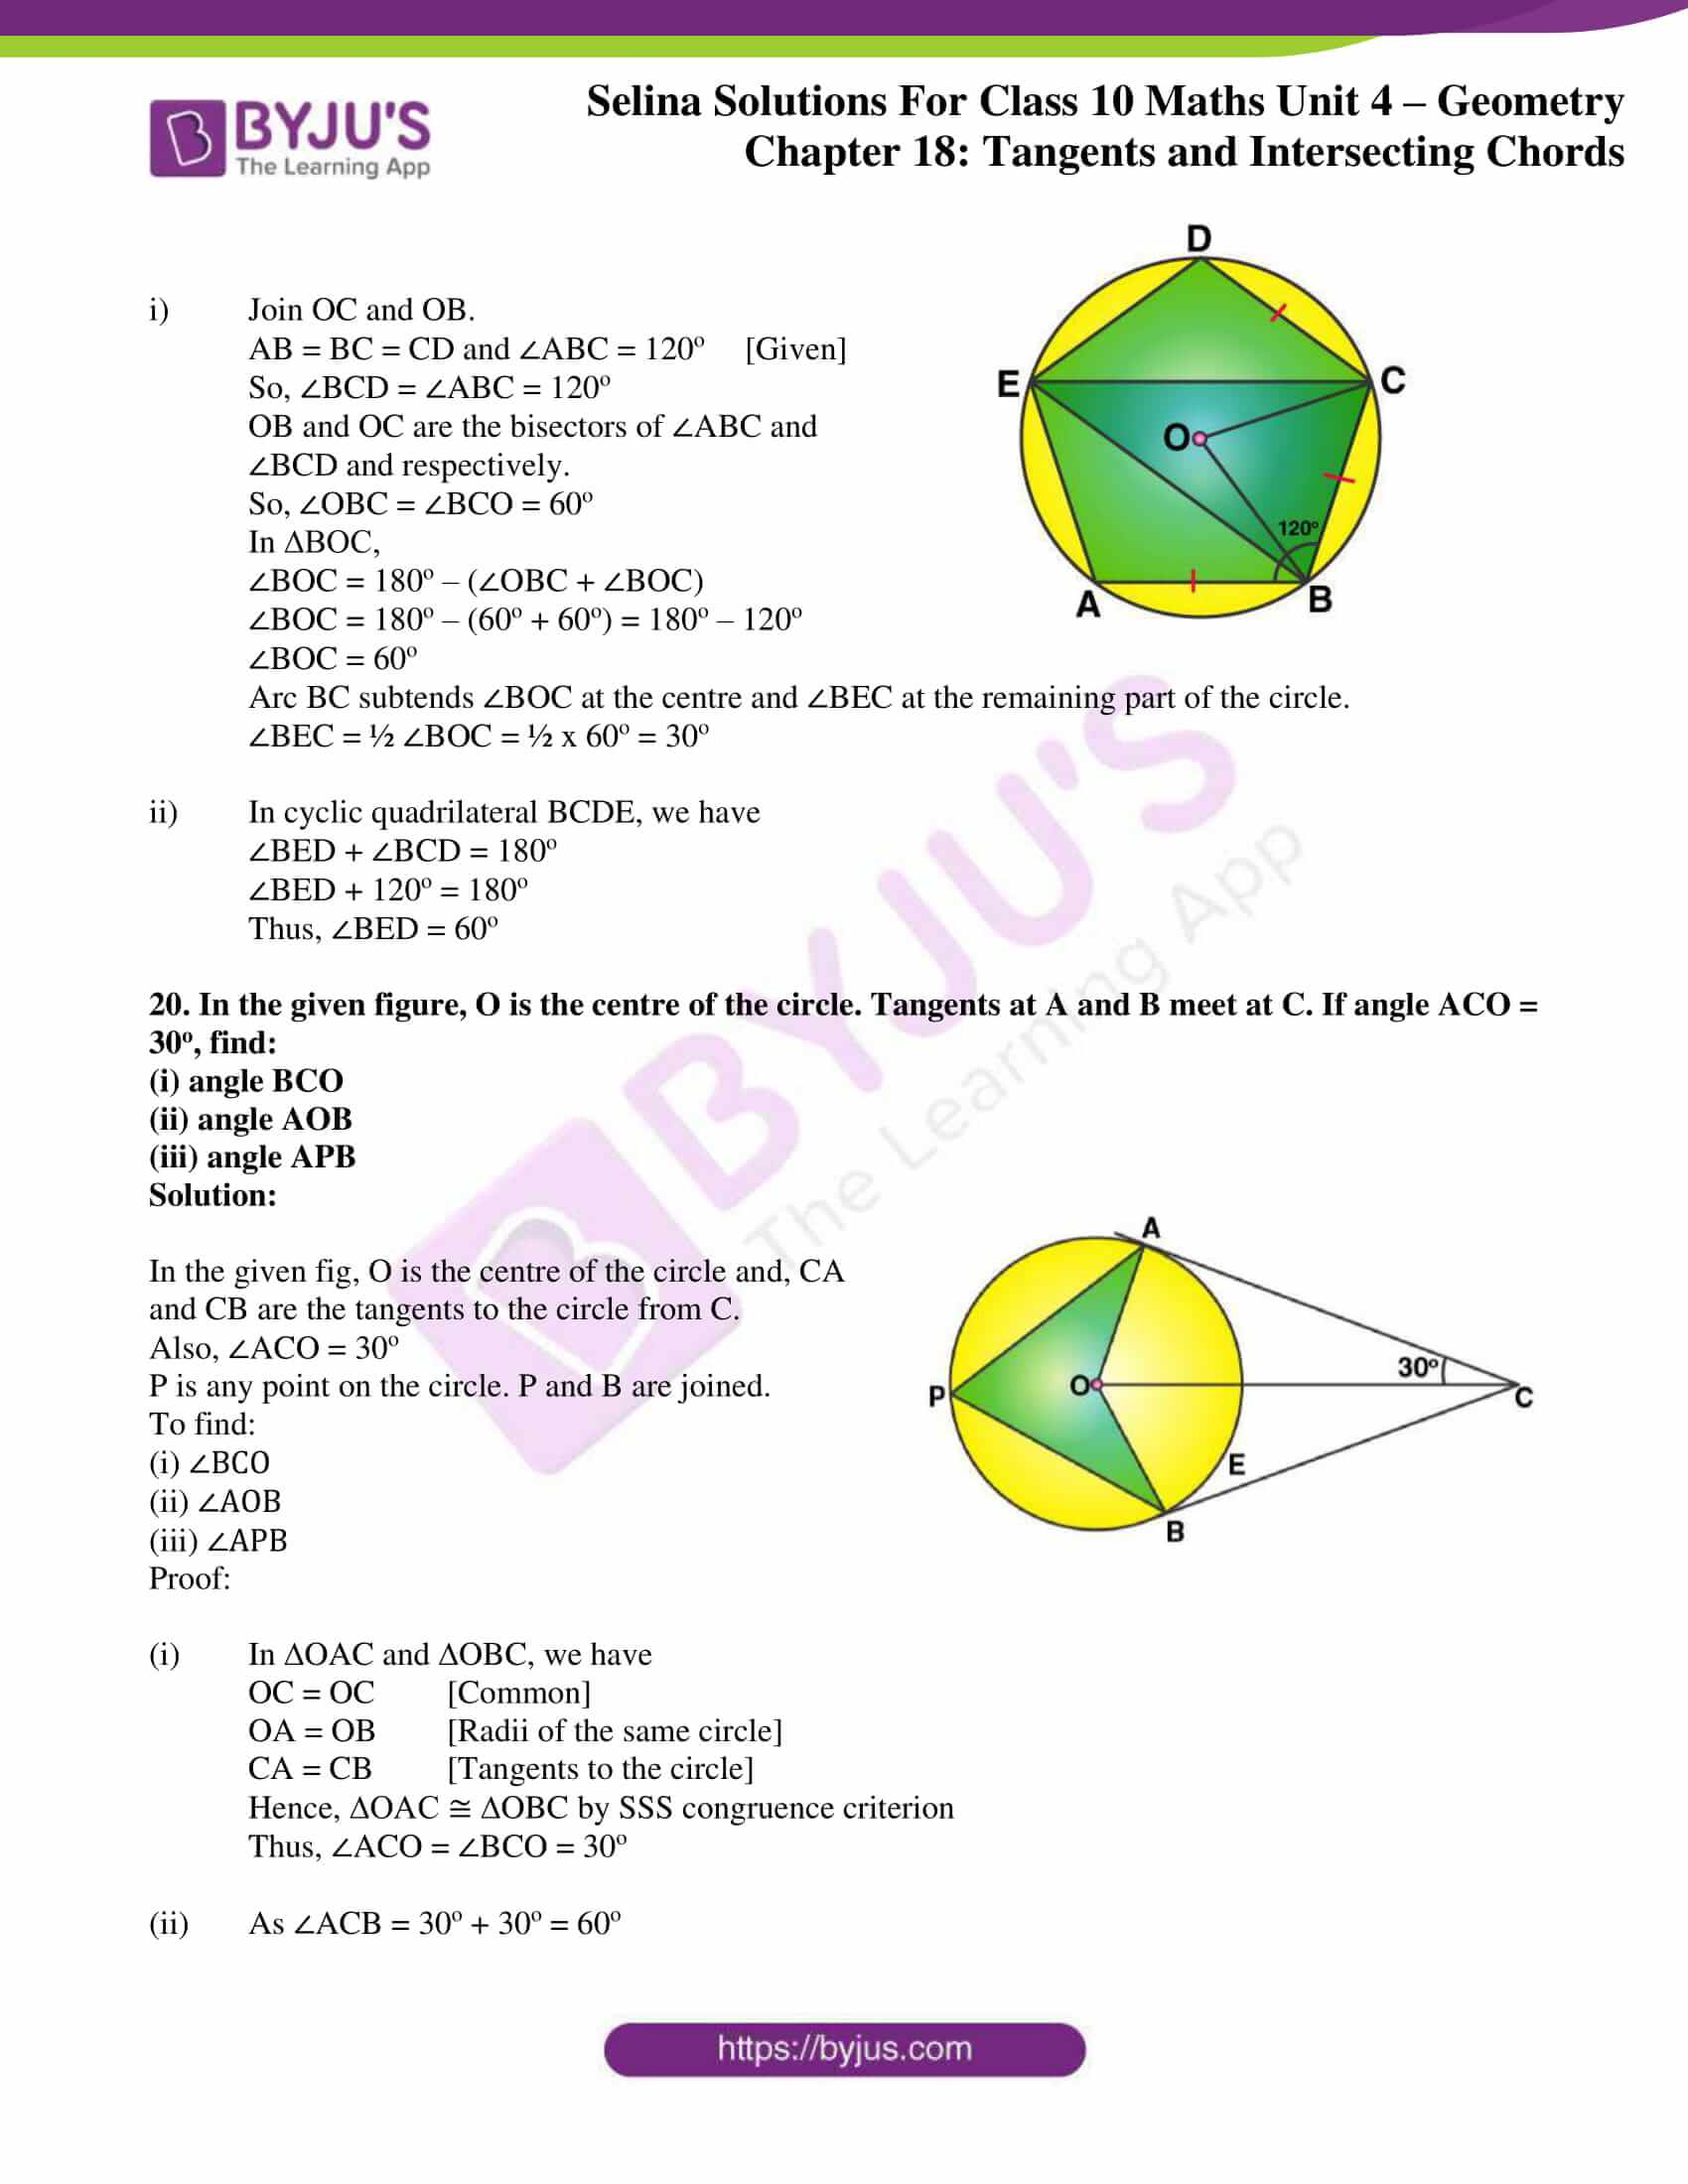 selina-sol-maths-class-10-ch-18-ex-c-11